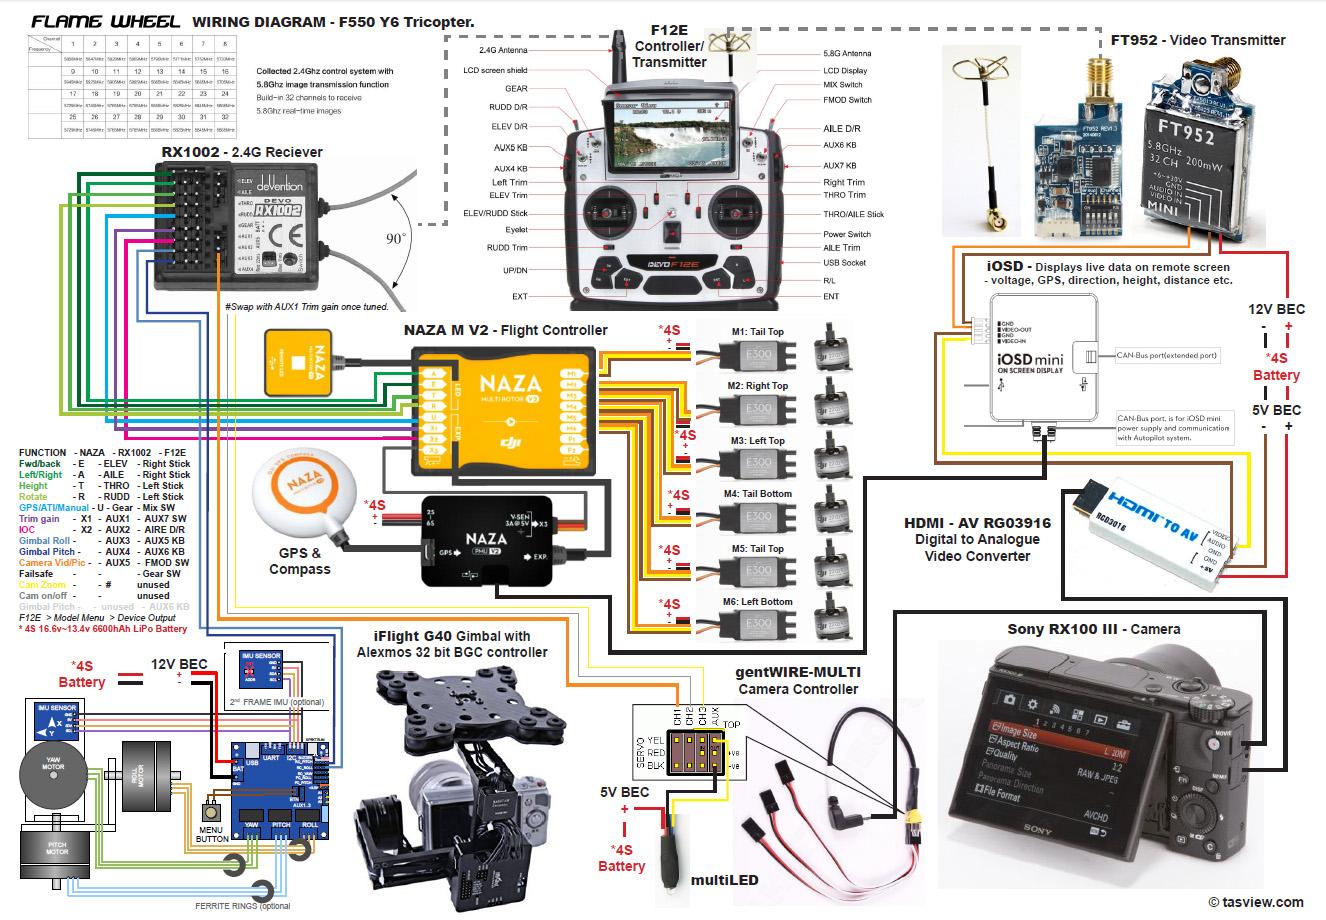 hight resolution of phantom 2 vision wiring diagram simple wiring diagrams house wiring circuits diagram phantom 2 vision wiring